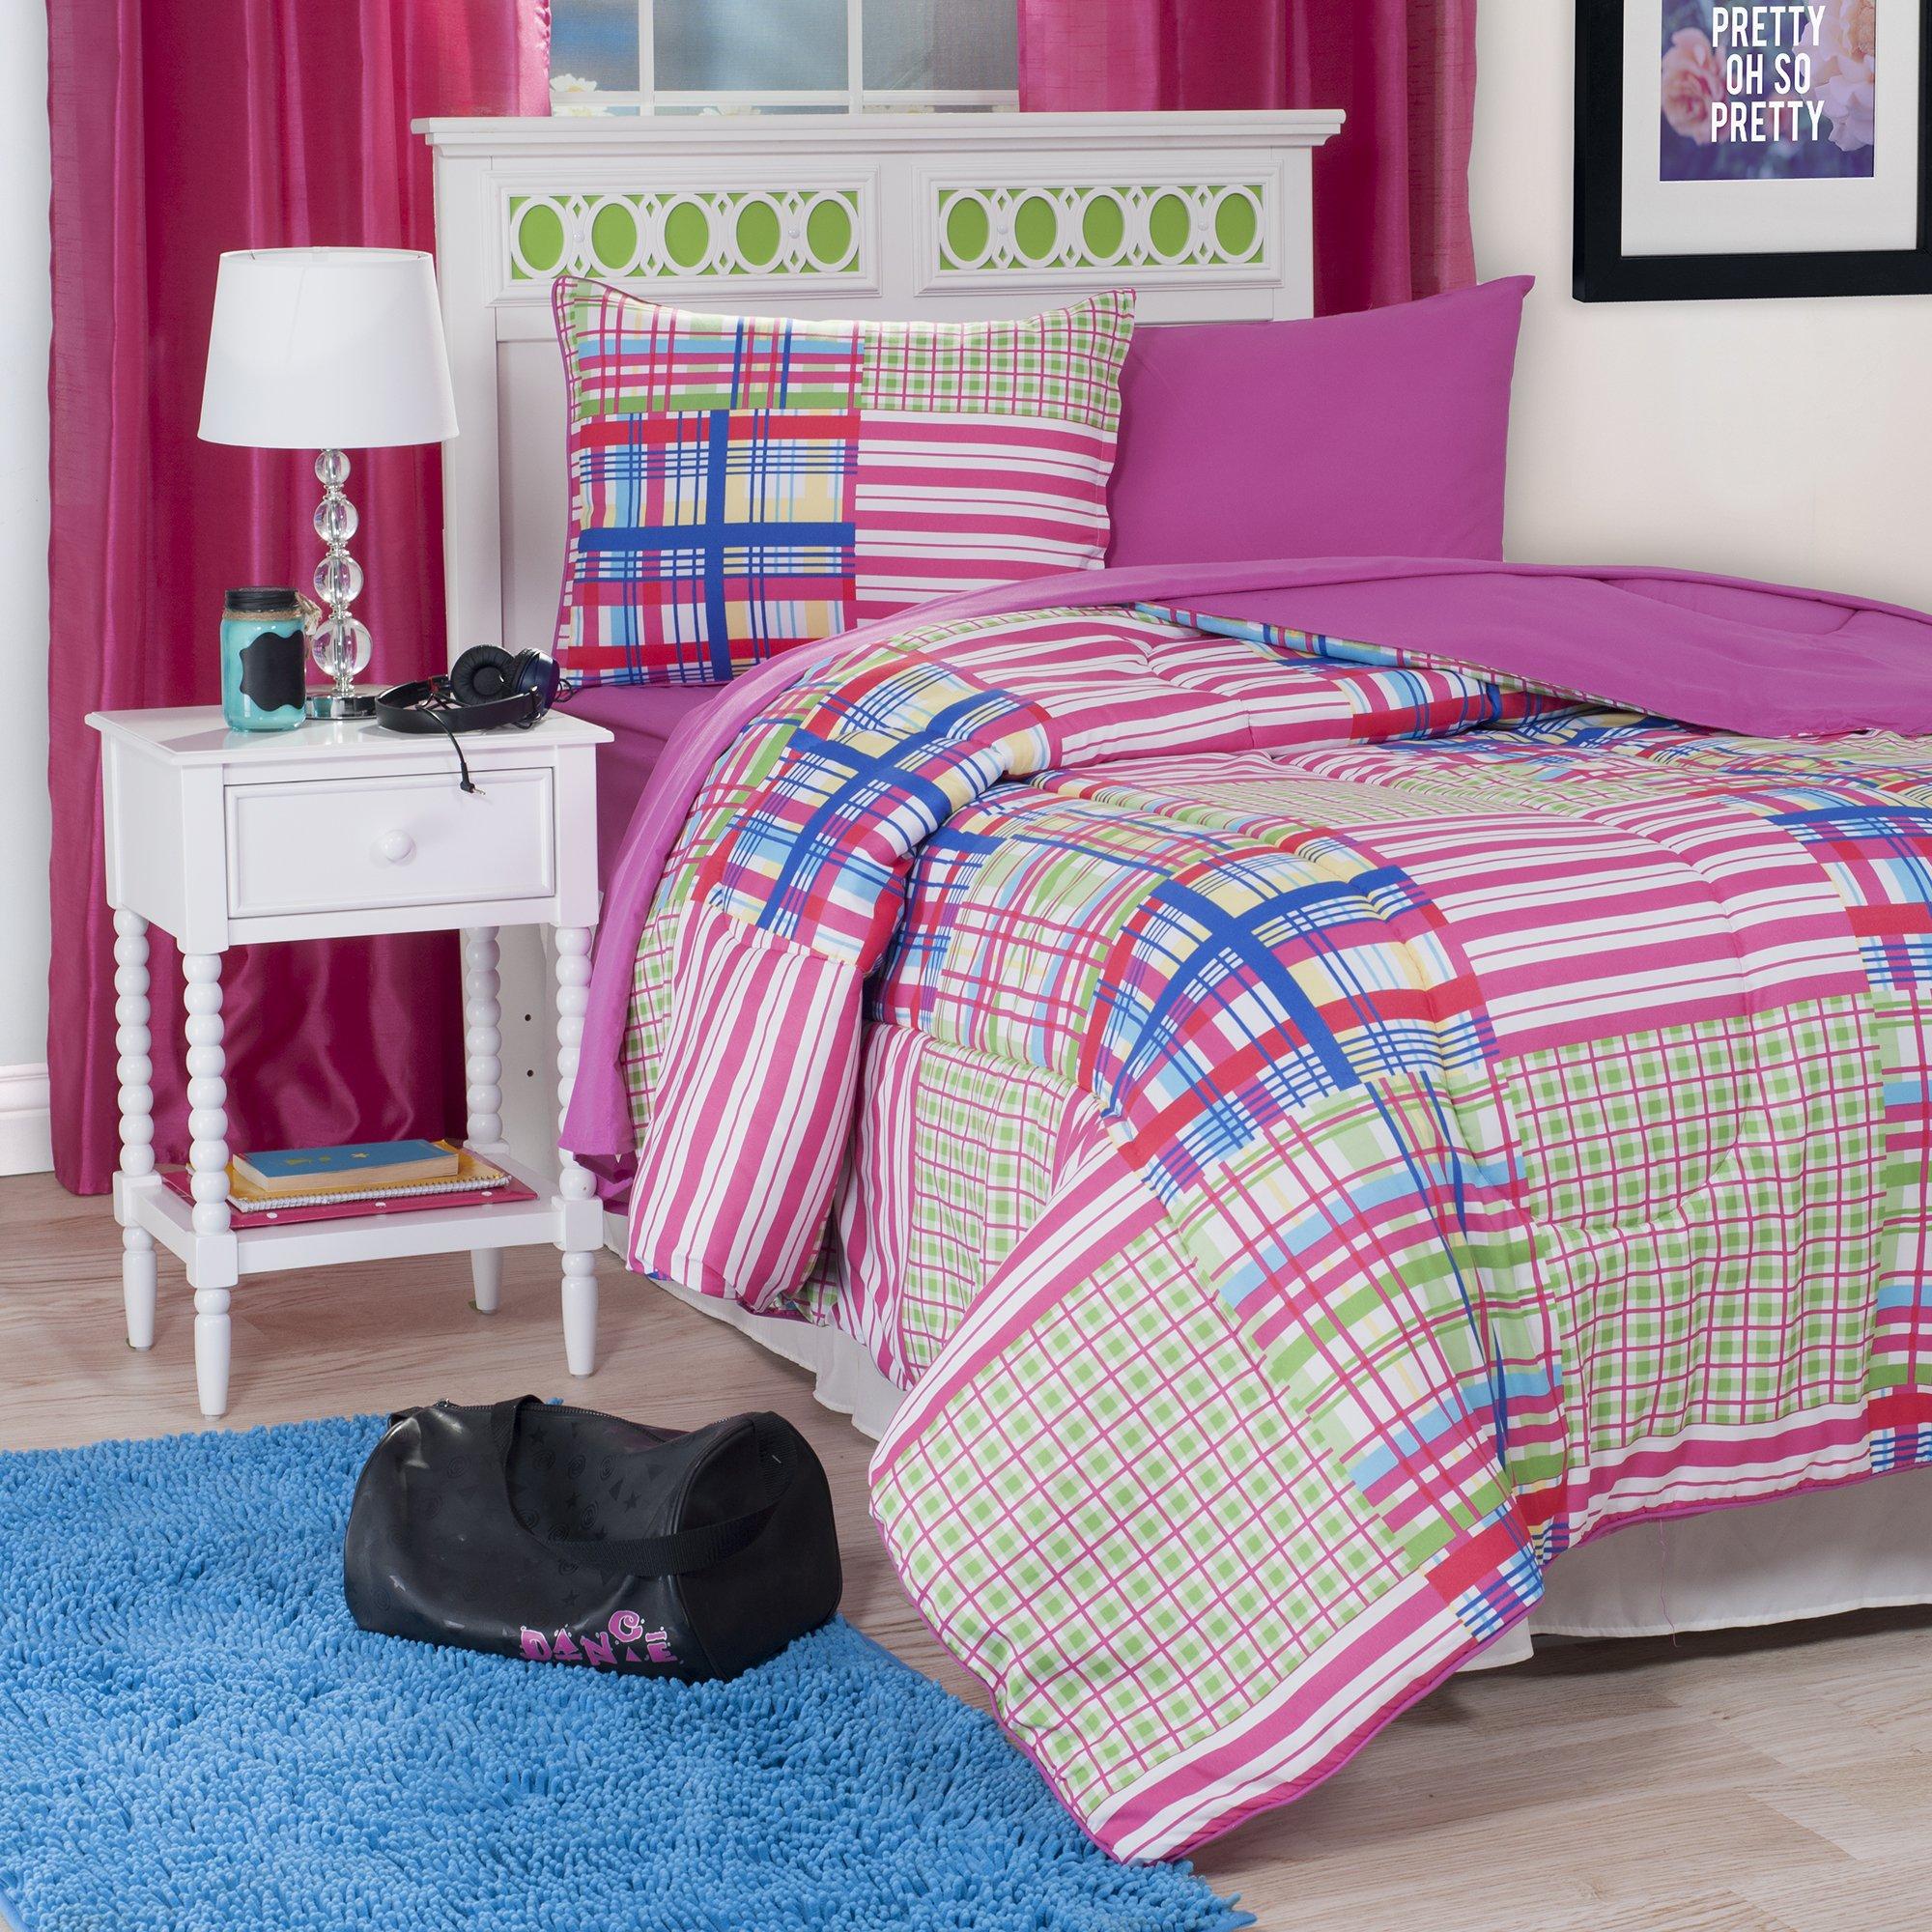 Everyday Home Nora 2 Piece Comforter Set - Twin XL